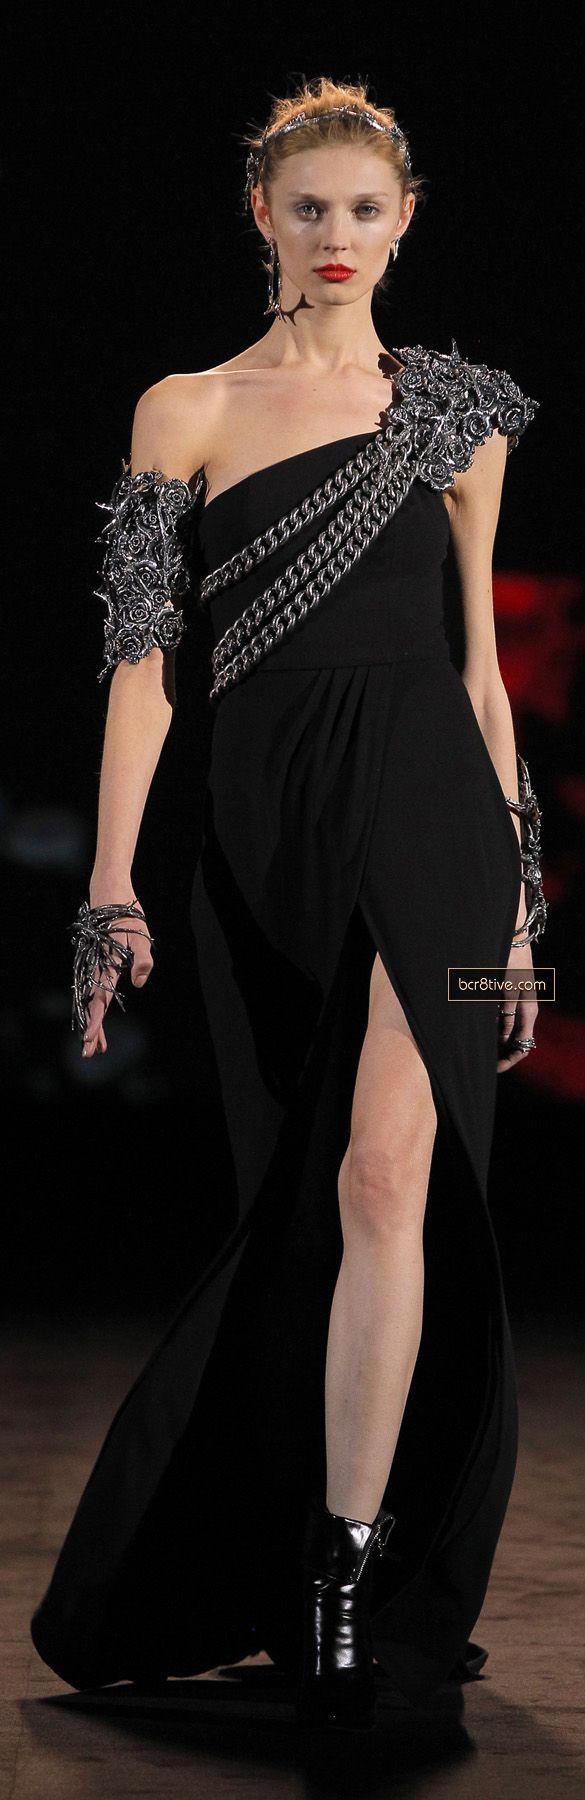 Home - Oni Onik NXI Oni onik fashion creations